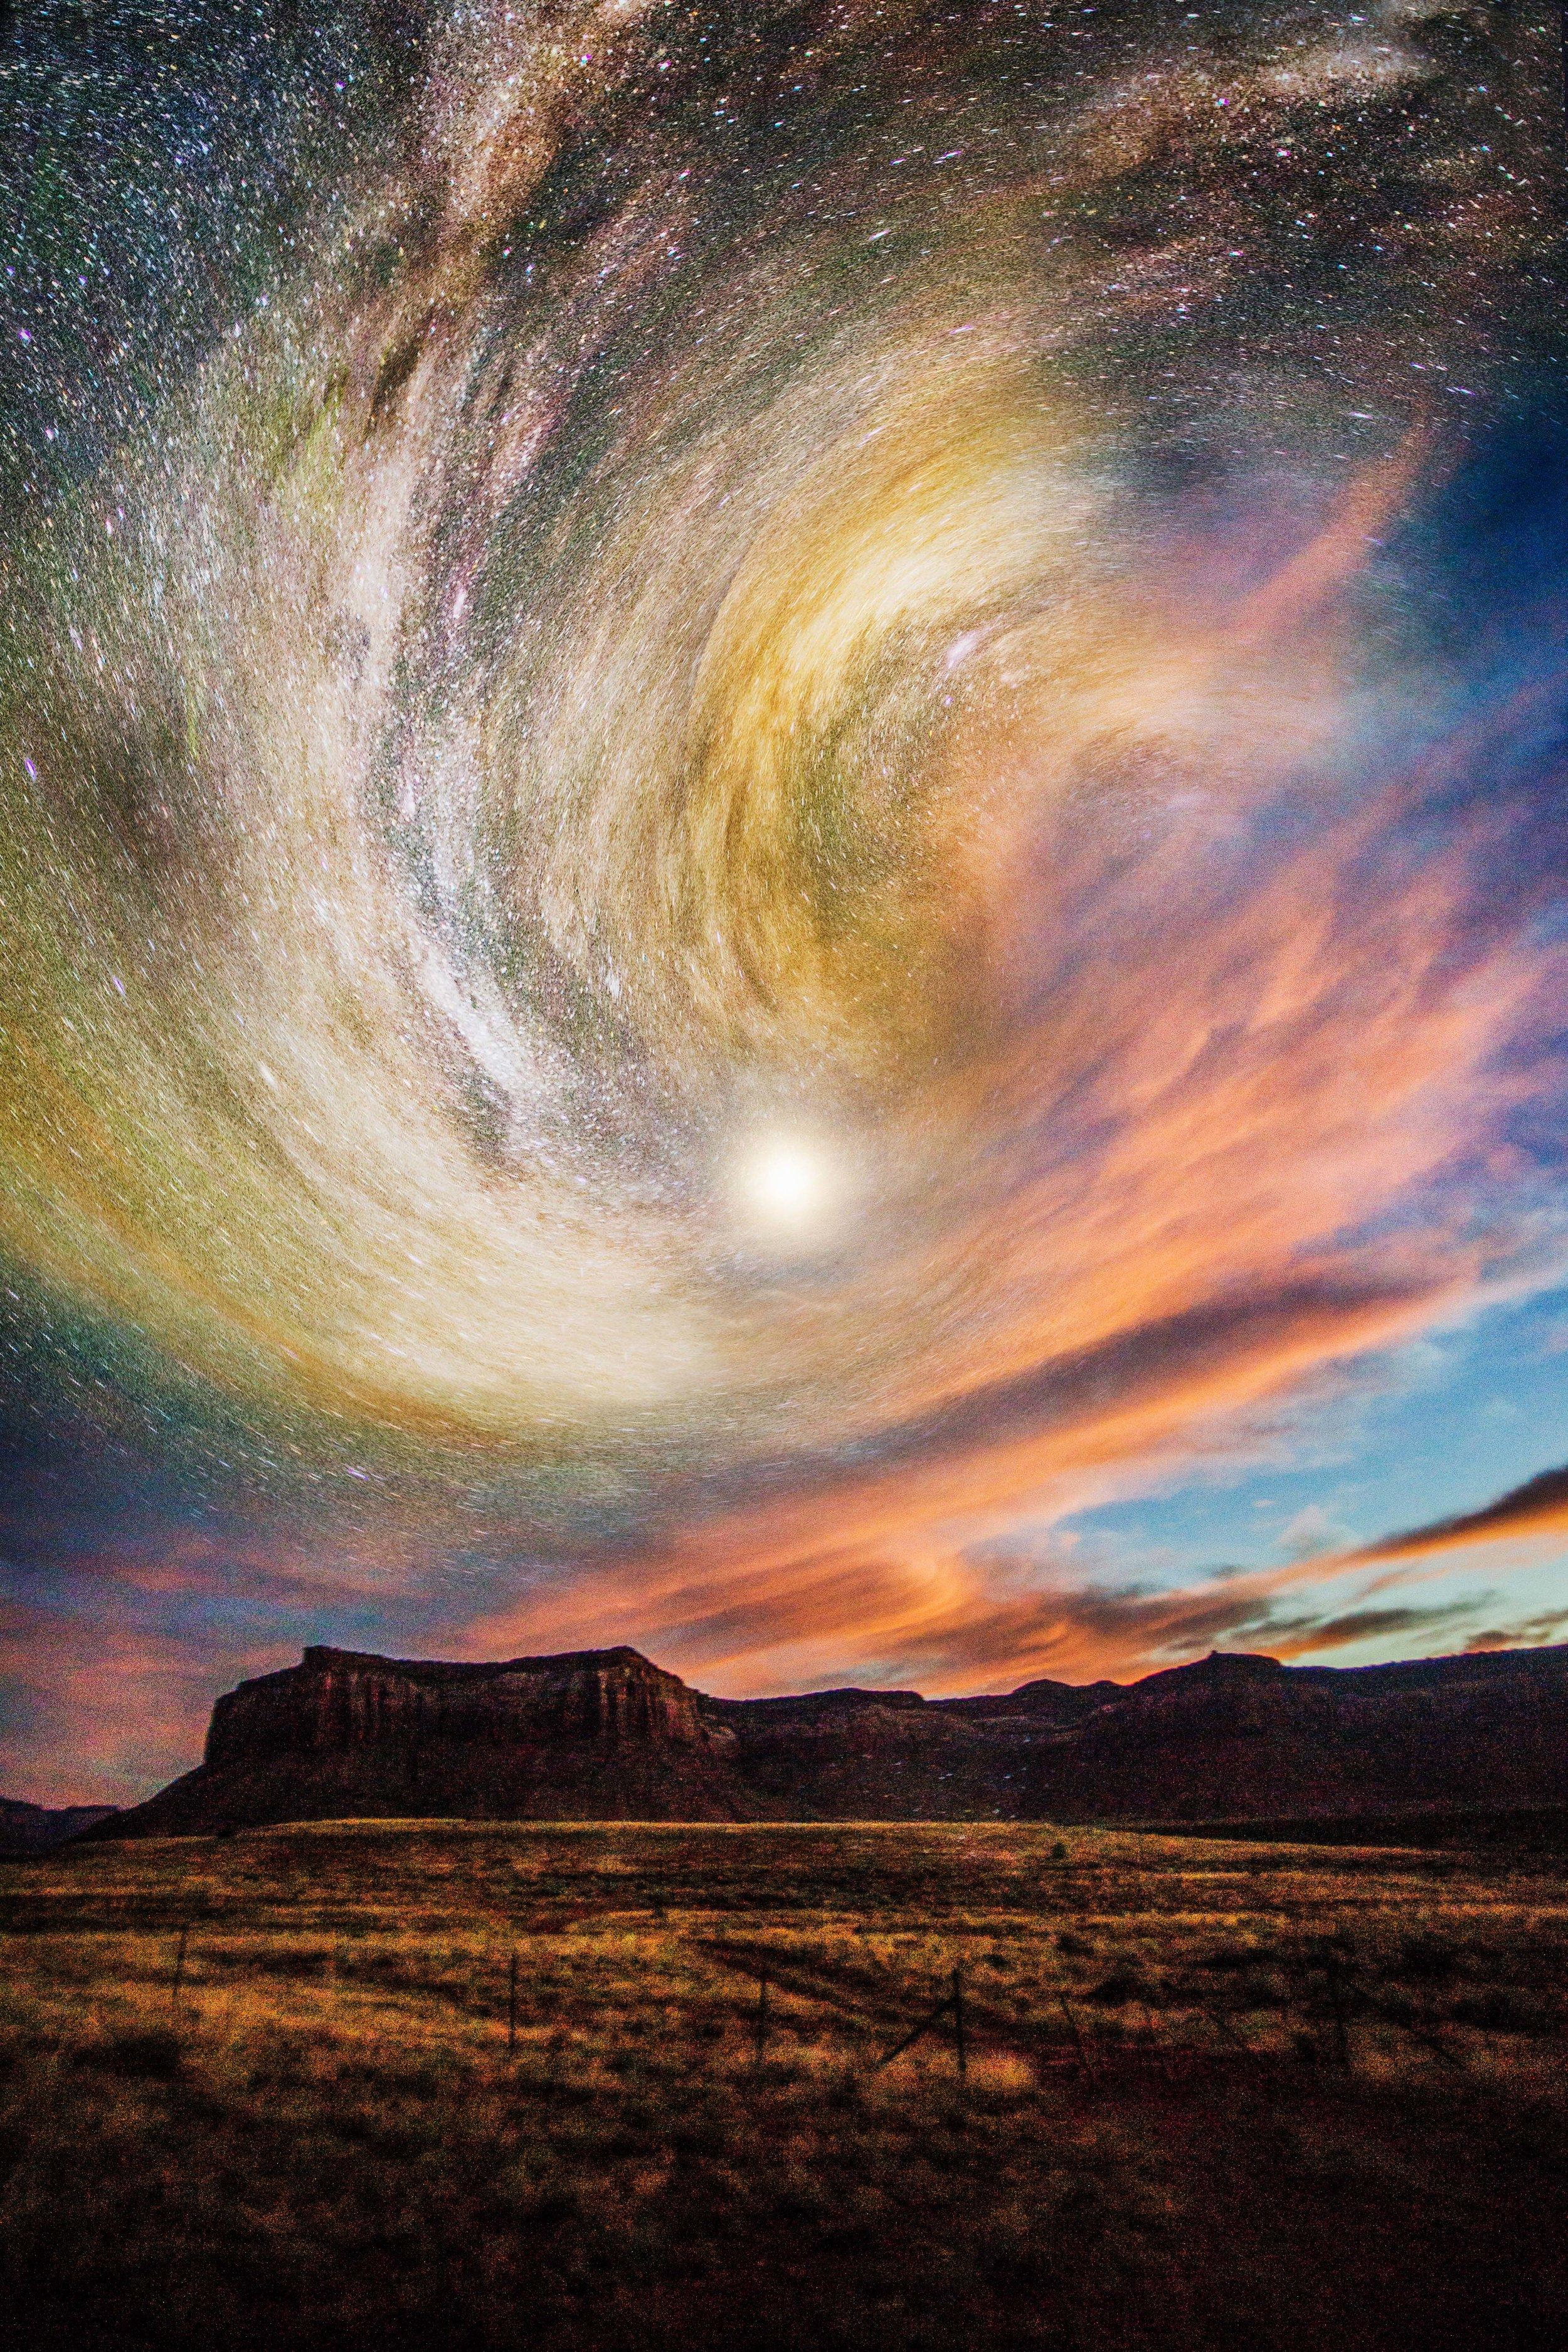 Lower Canyonlands National Park, Utah (post processed)